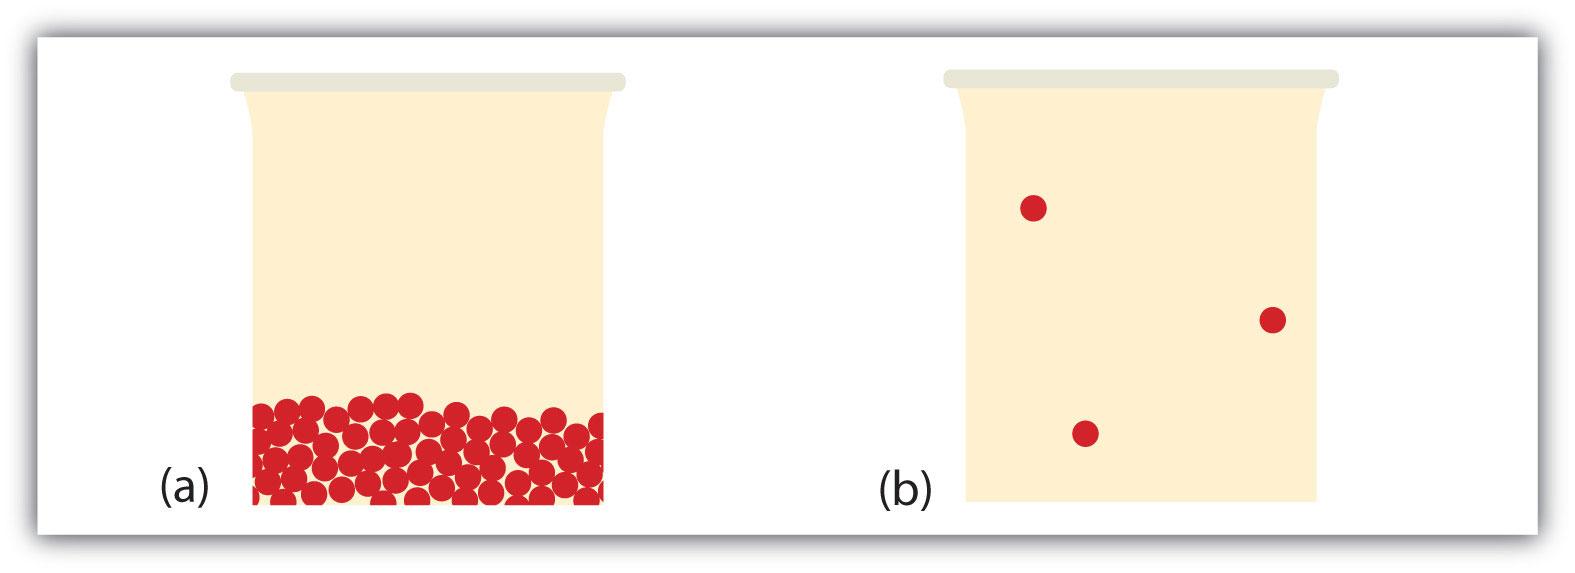 Diagrams comapring liquid and gas particles